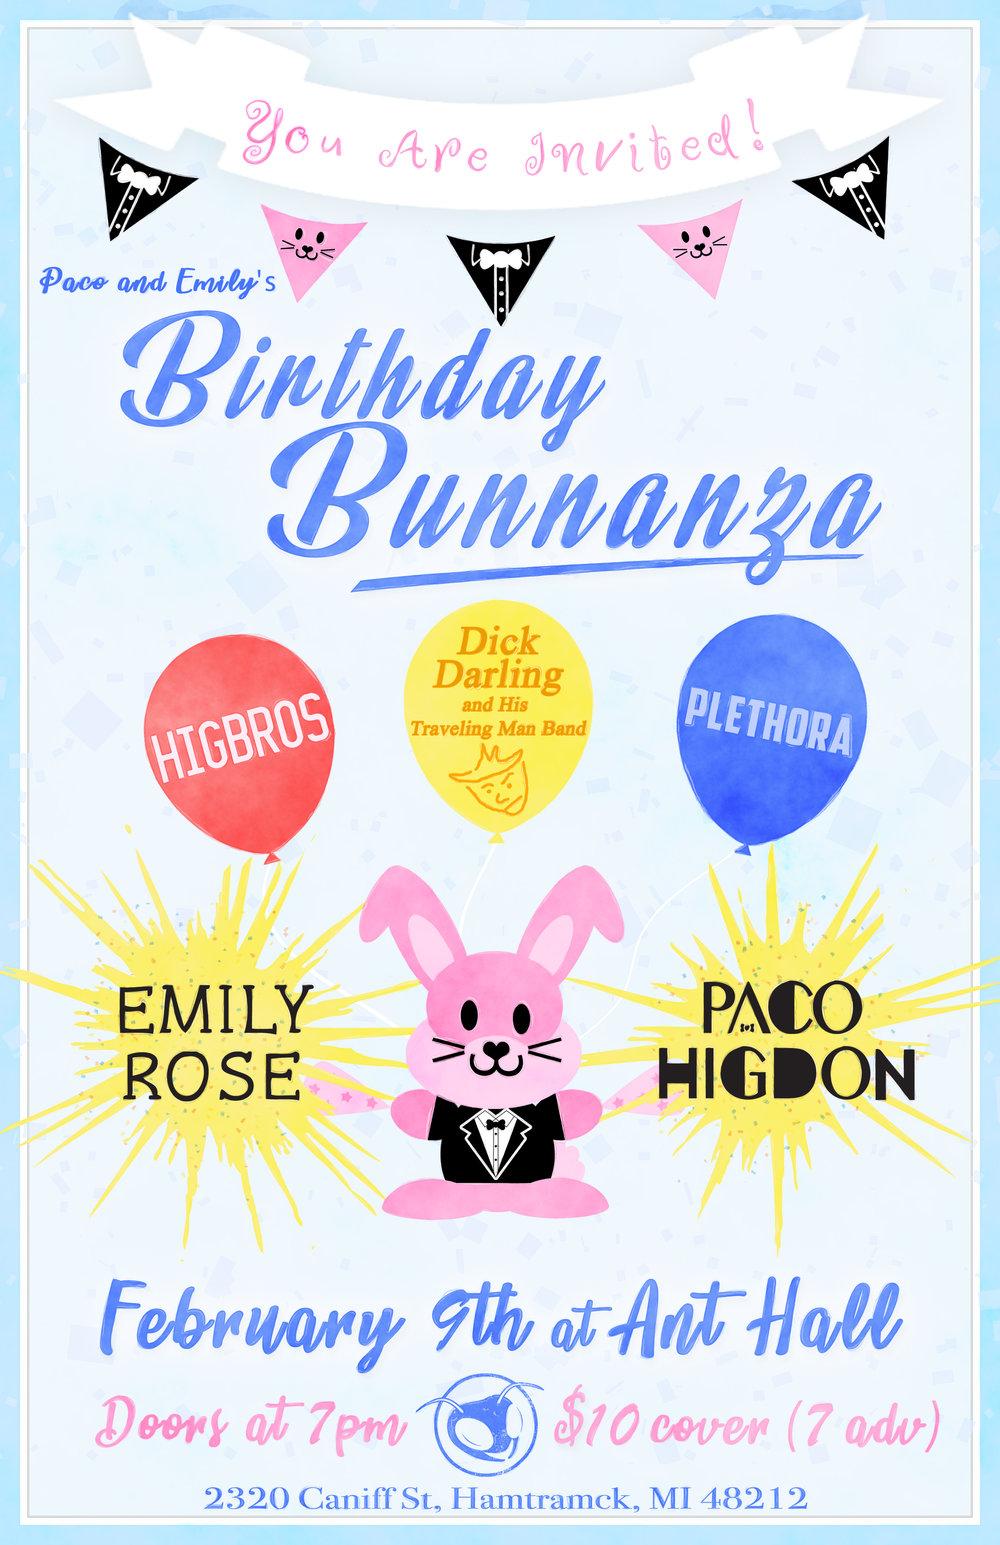 Paco EmilyRose Birthday Poster 11x17.jpg